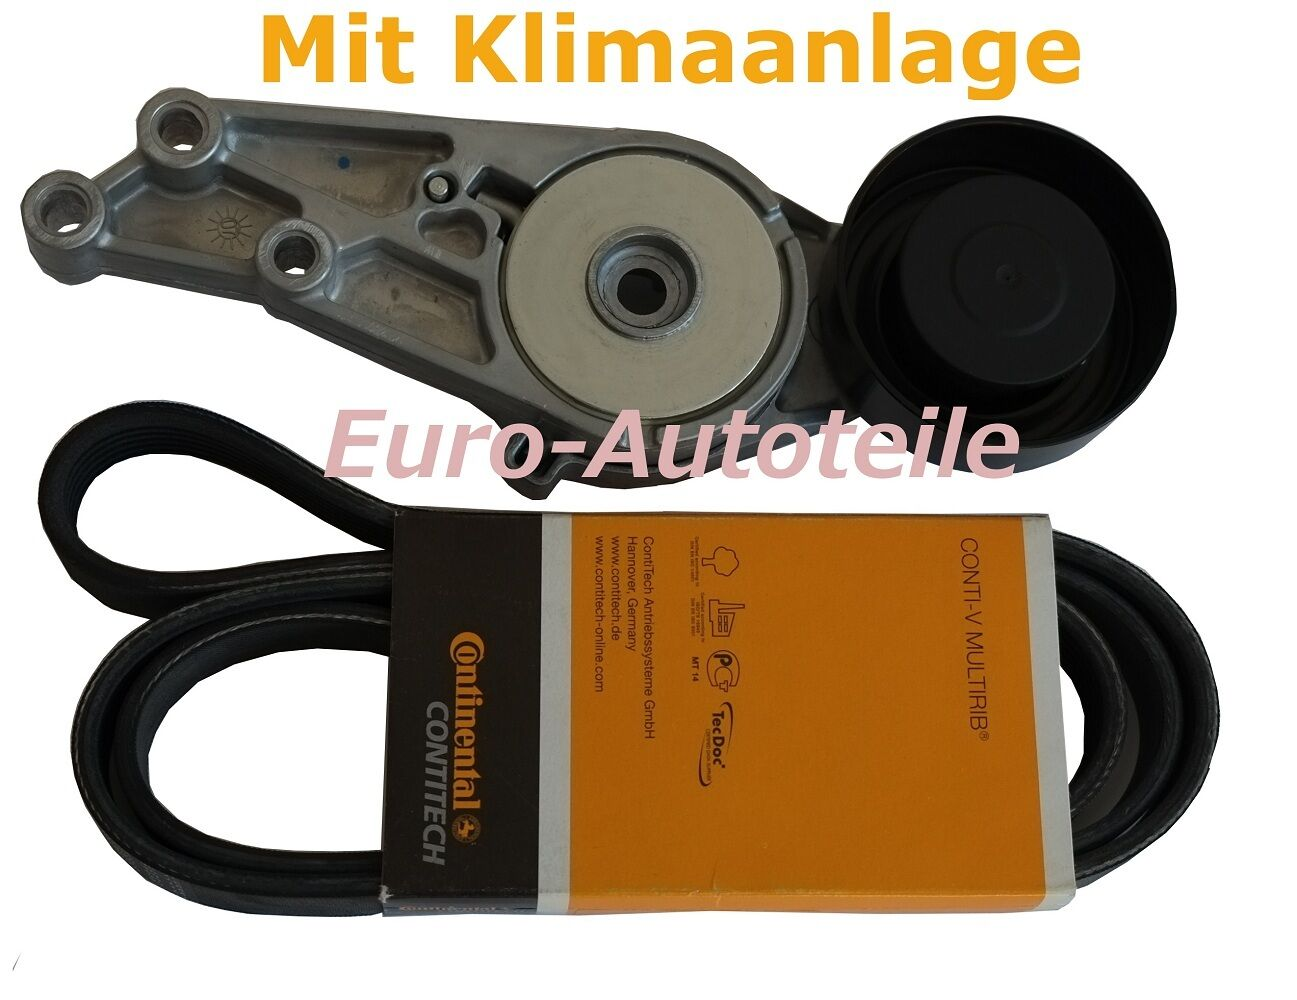 DAYCO 6PK1538 Spannrolle Umlenkrolle Bmw 3er E46 5PK865 Keilrippenriemensatz